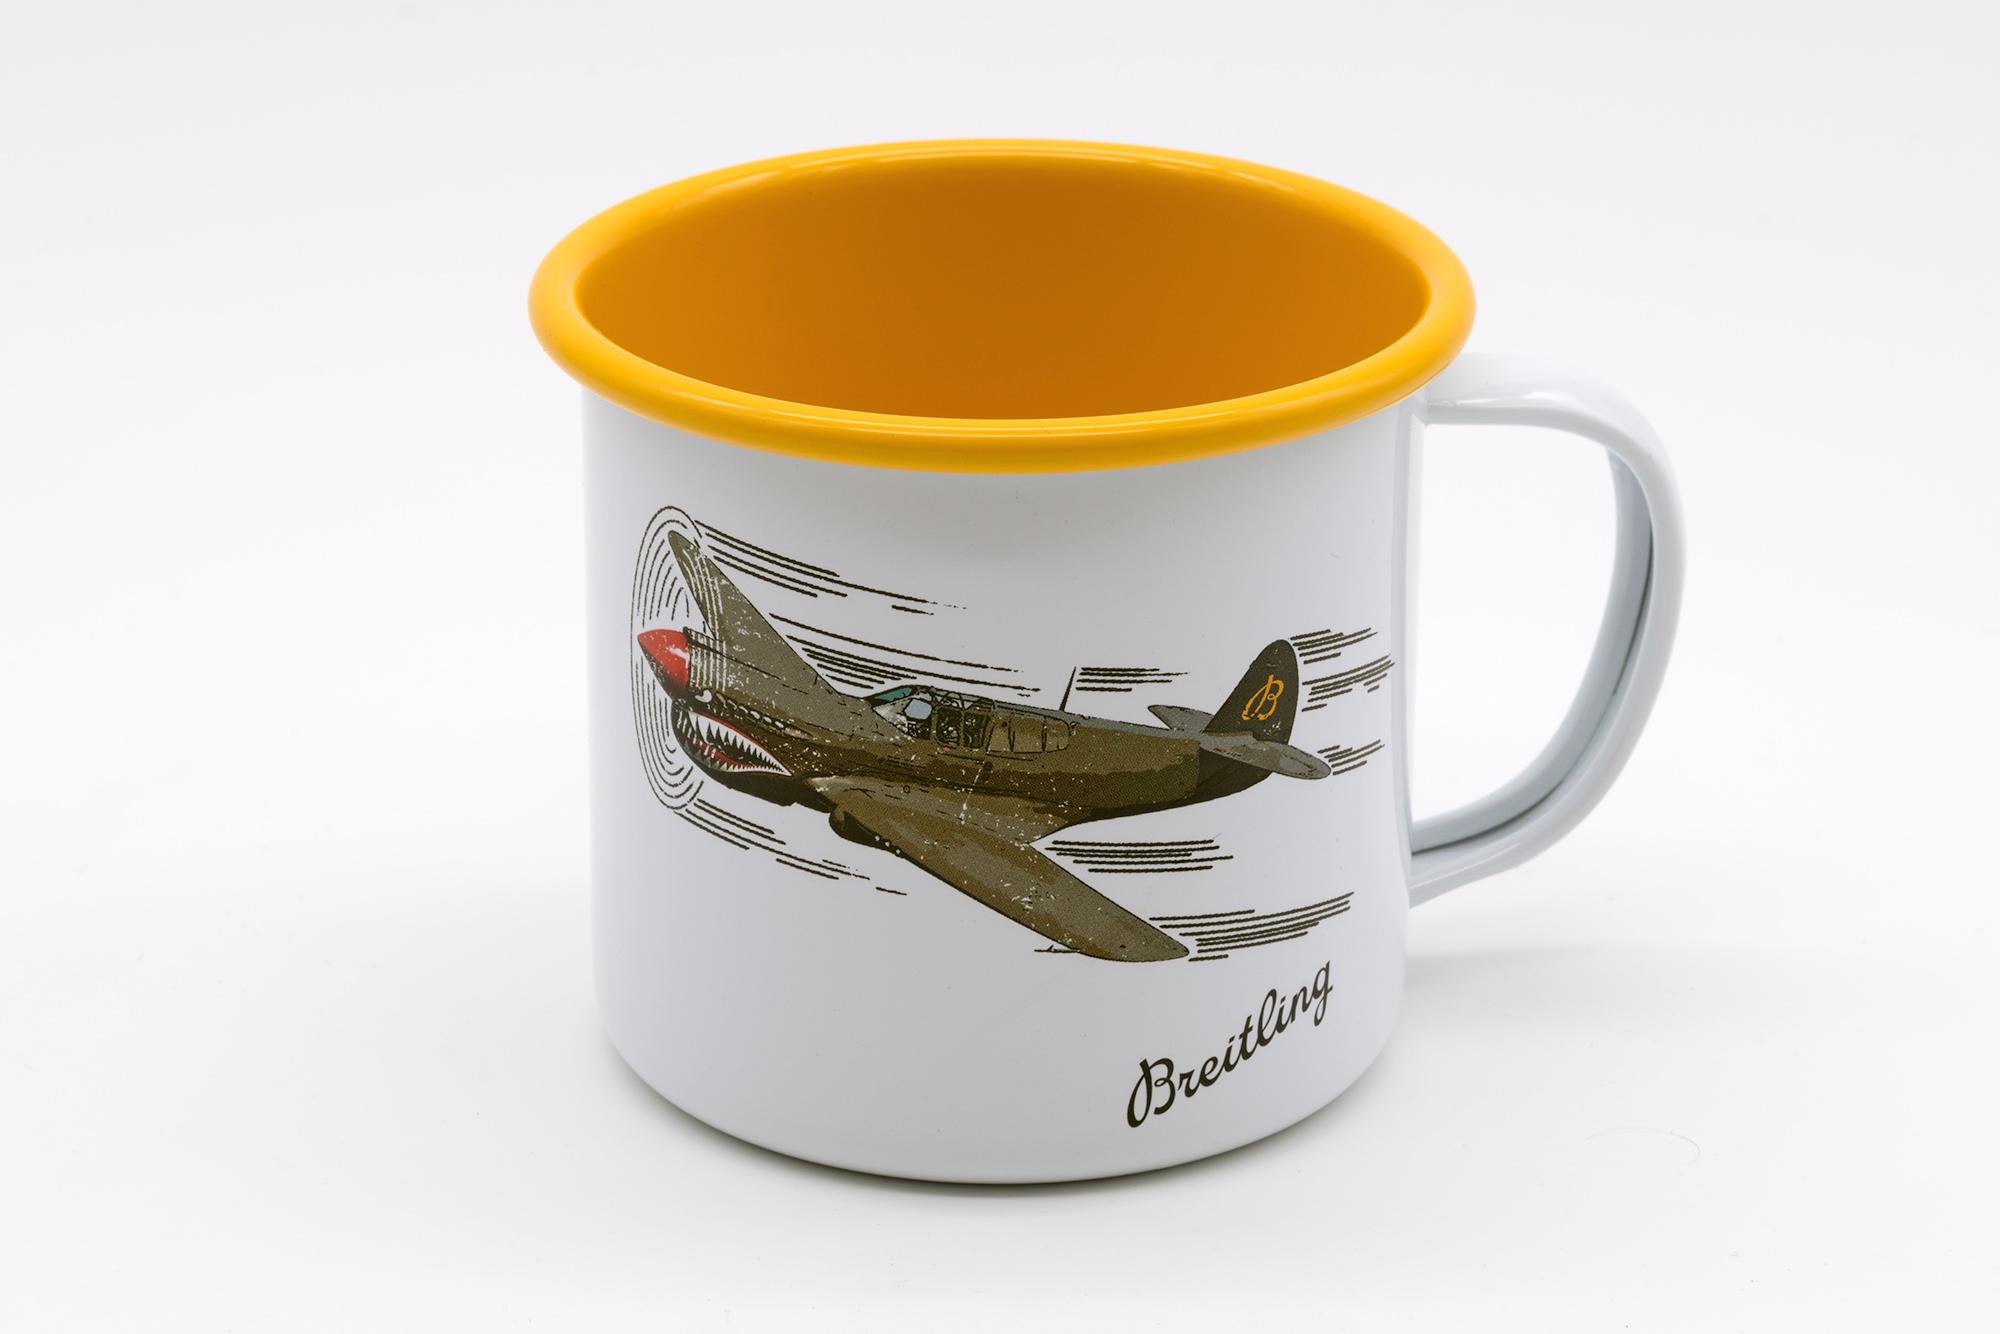 steel-mug-front-plane